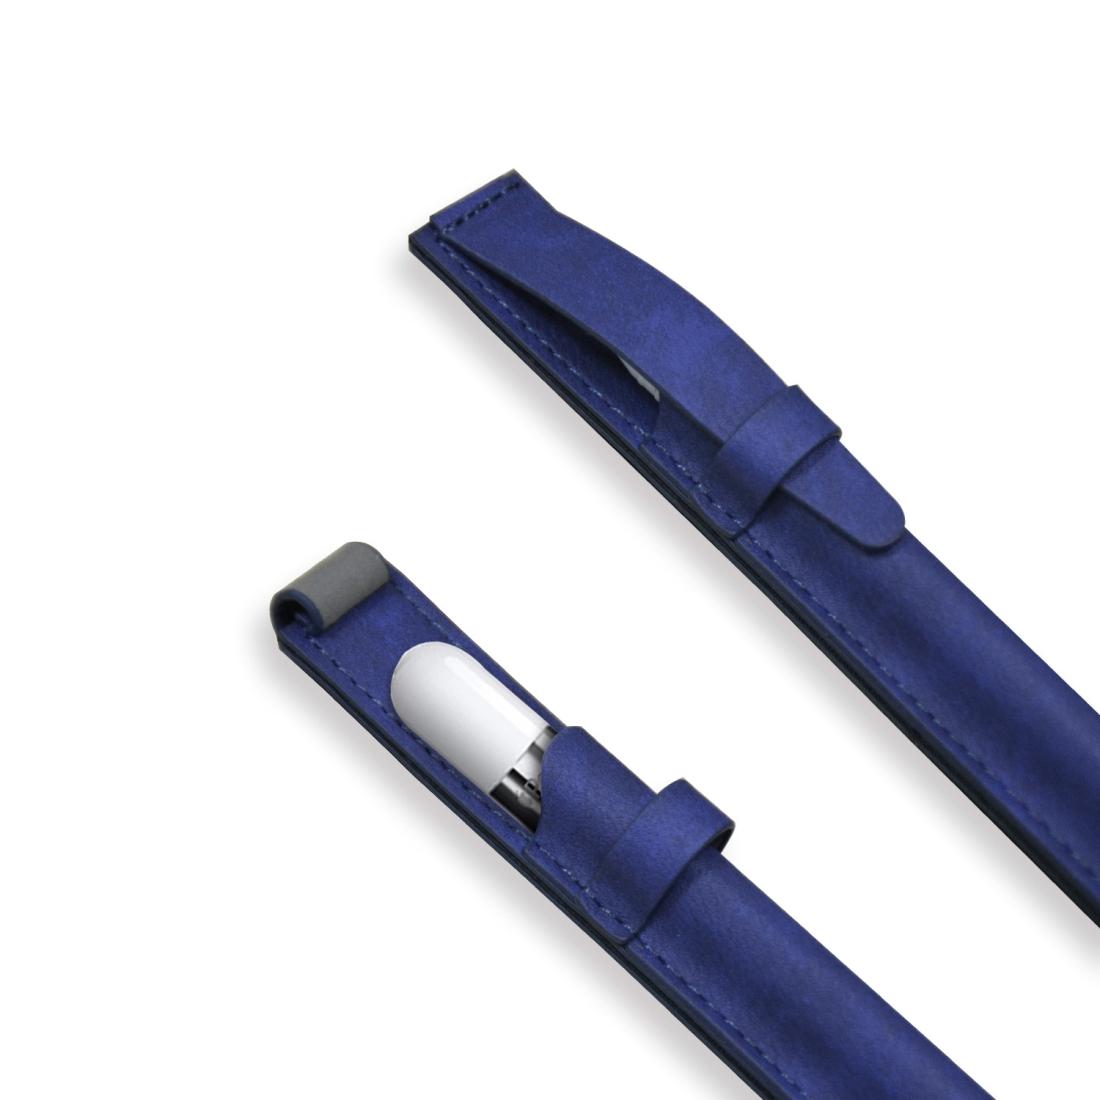 Apple Stylus Pen Protective Case for Apple Pencil (Dark Blue)